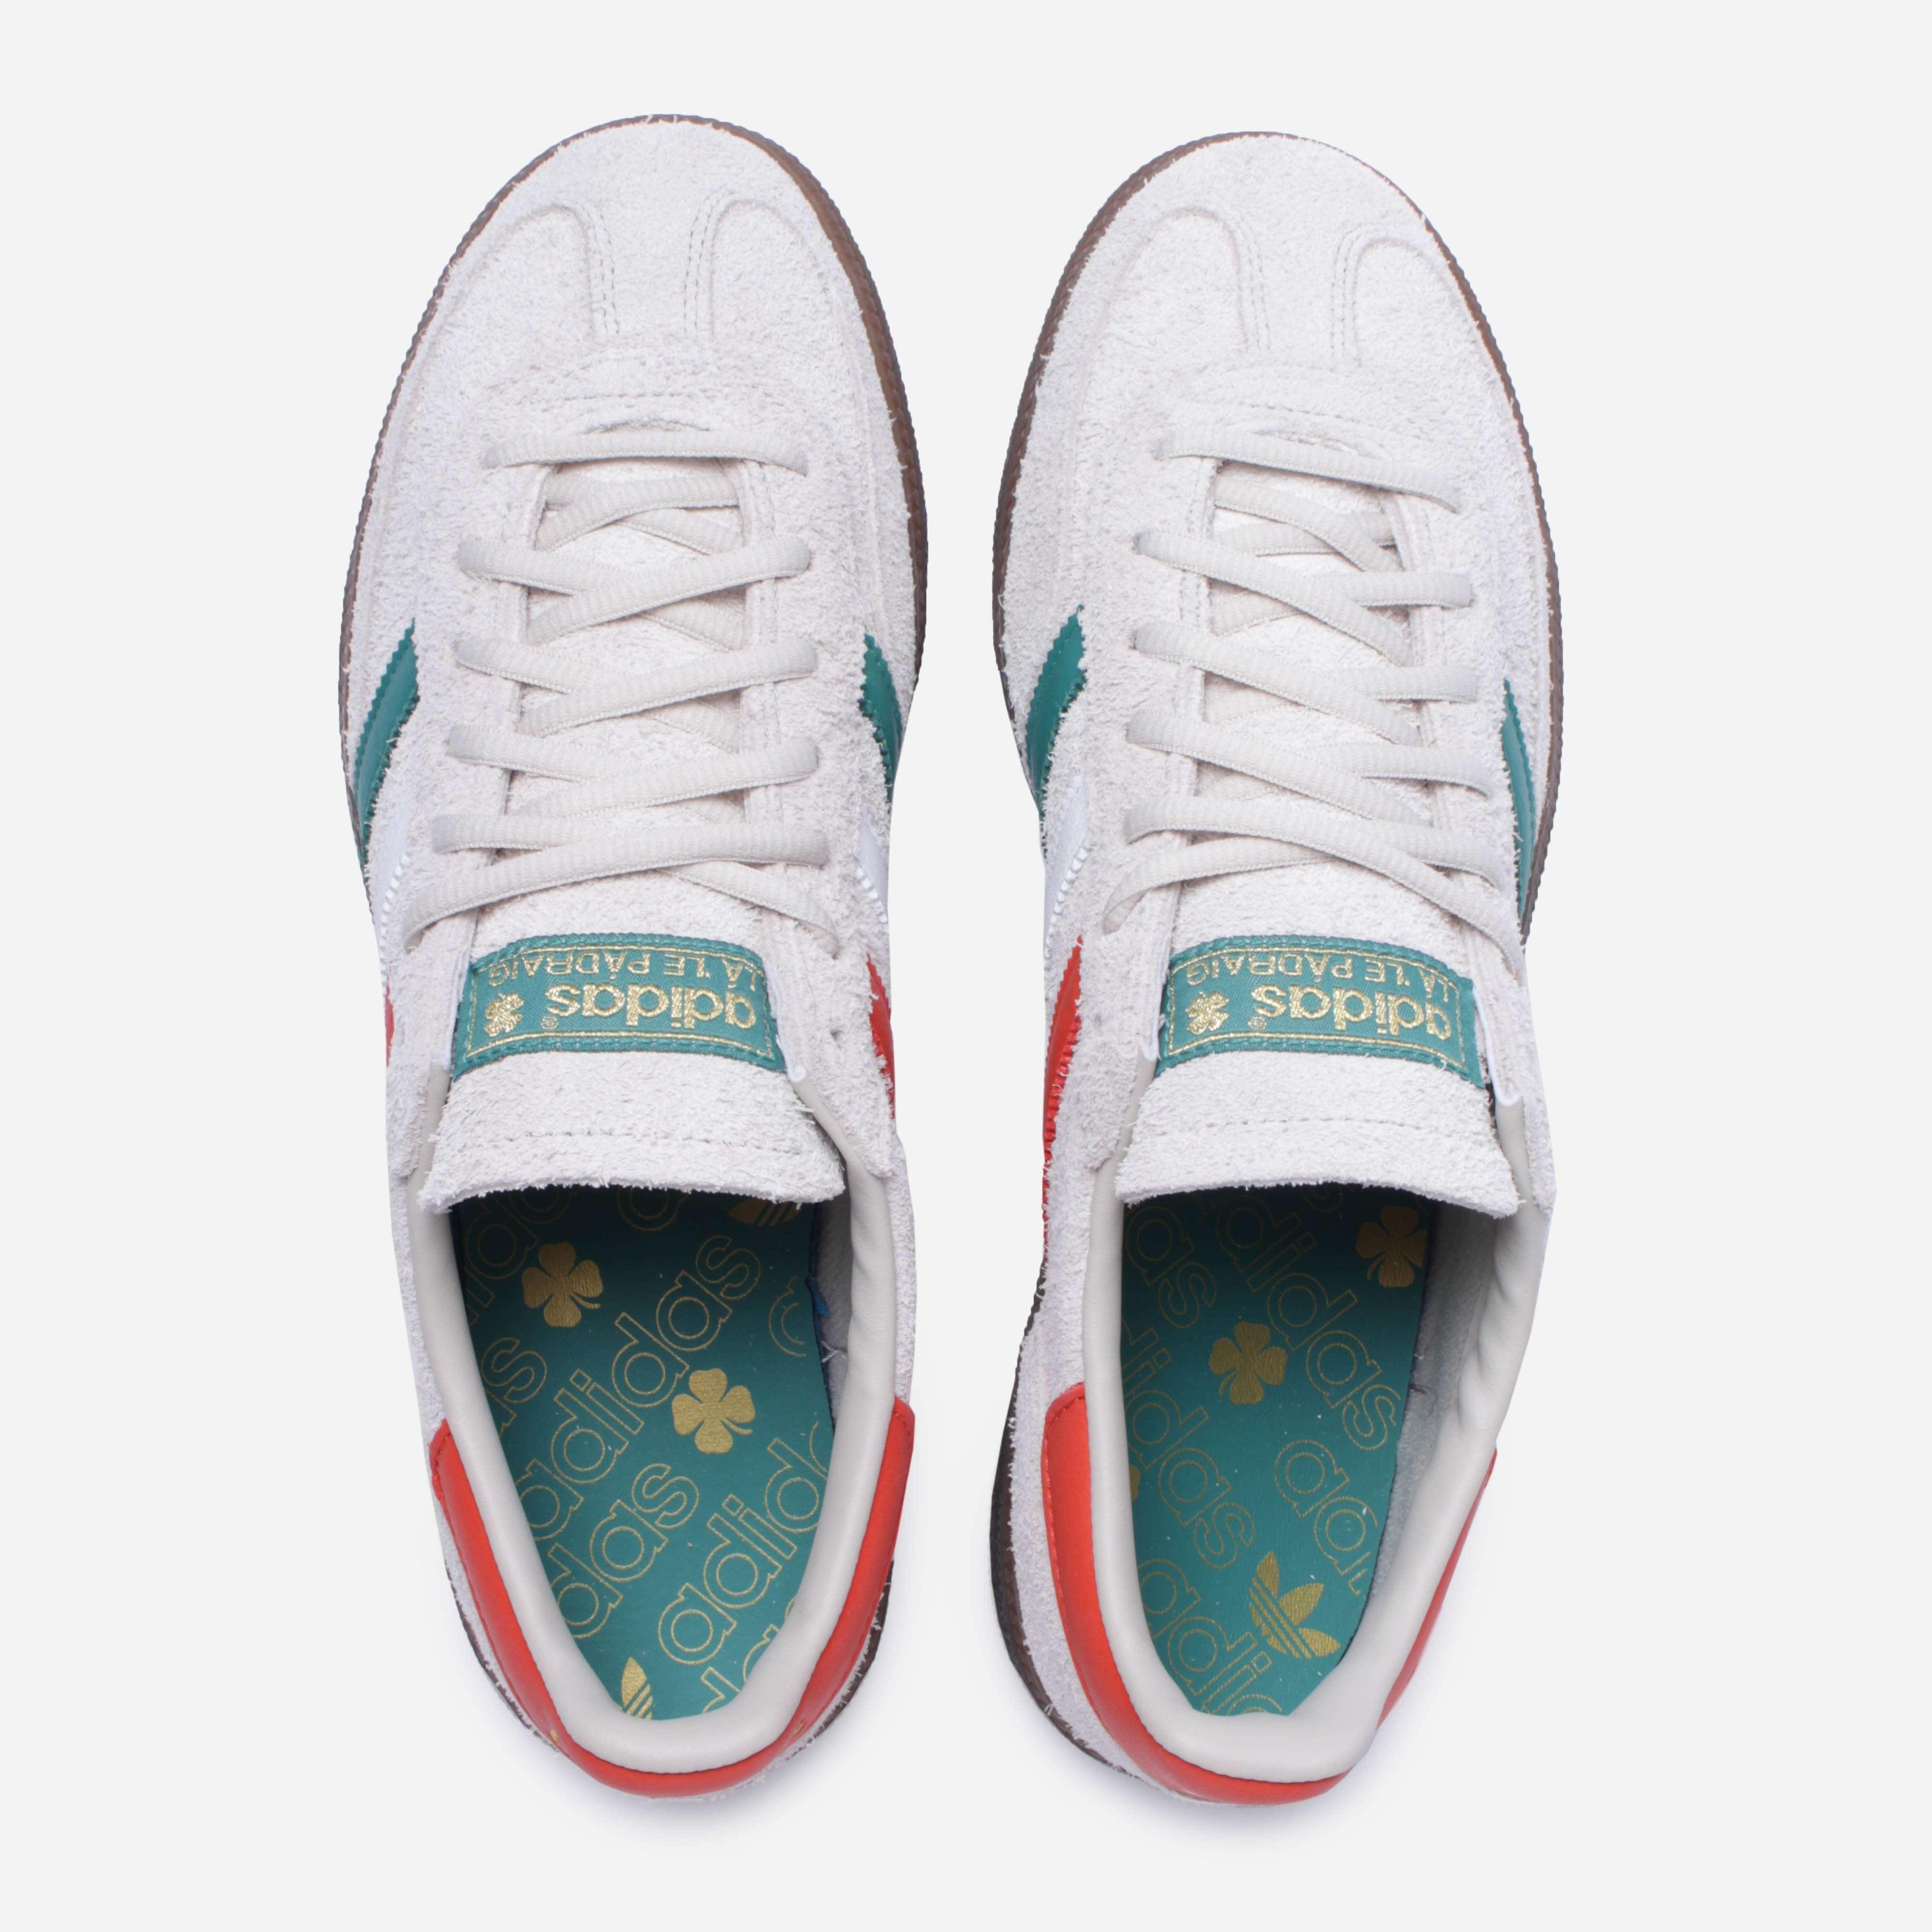 adidas Originals Handball Spezial St. Patrick's Day